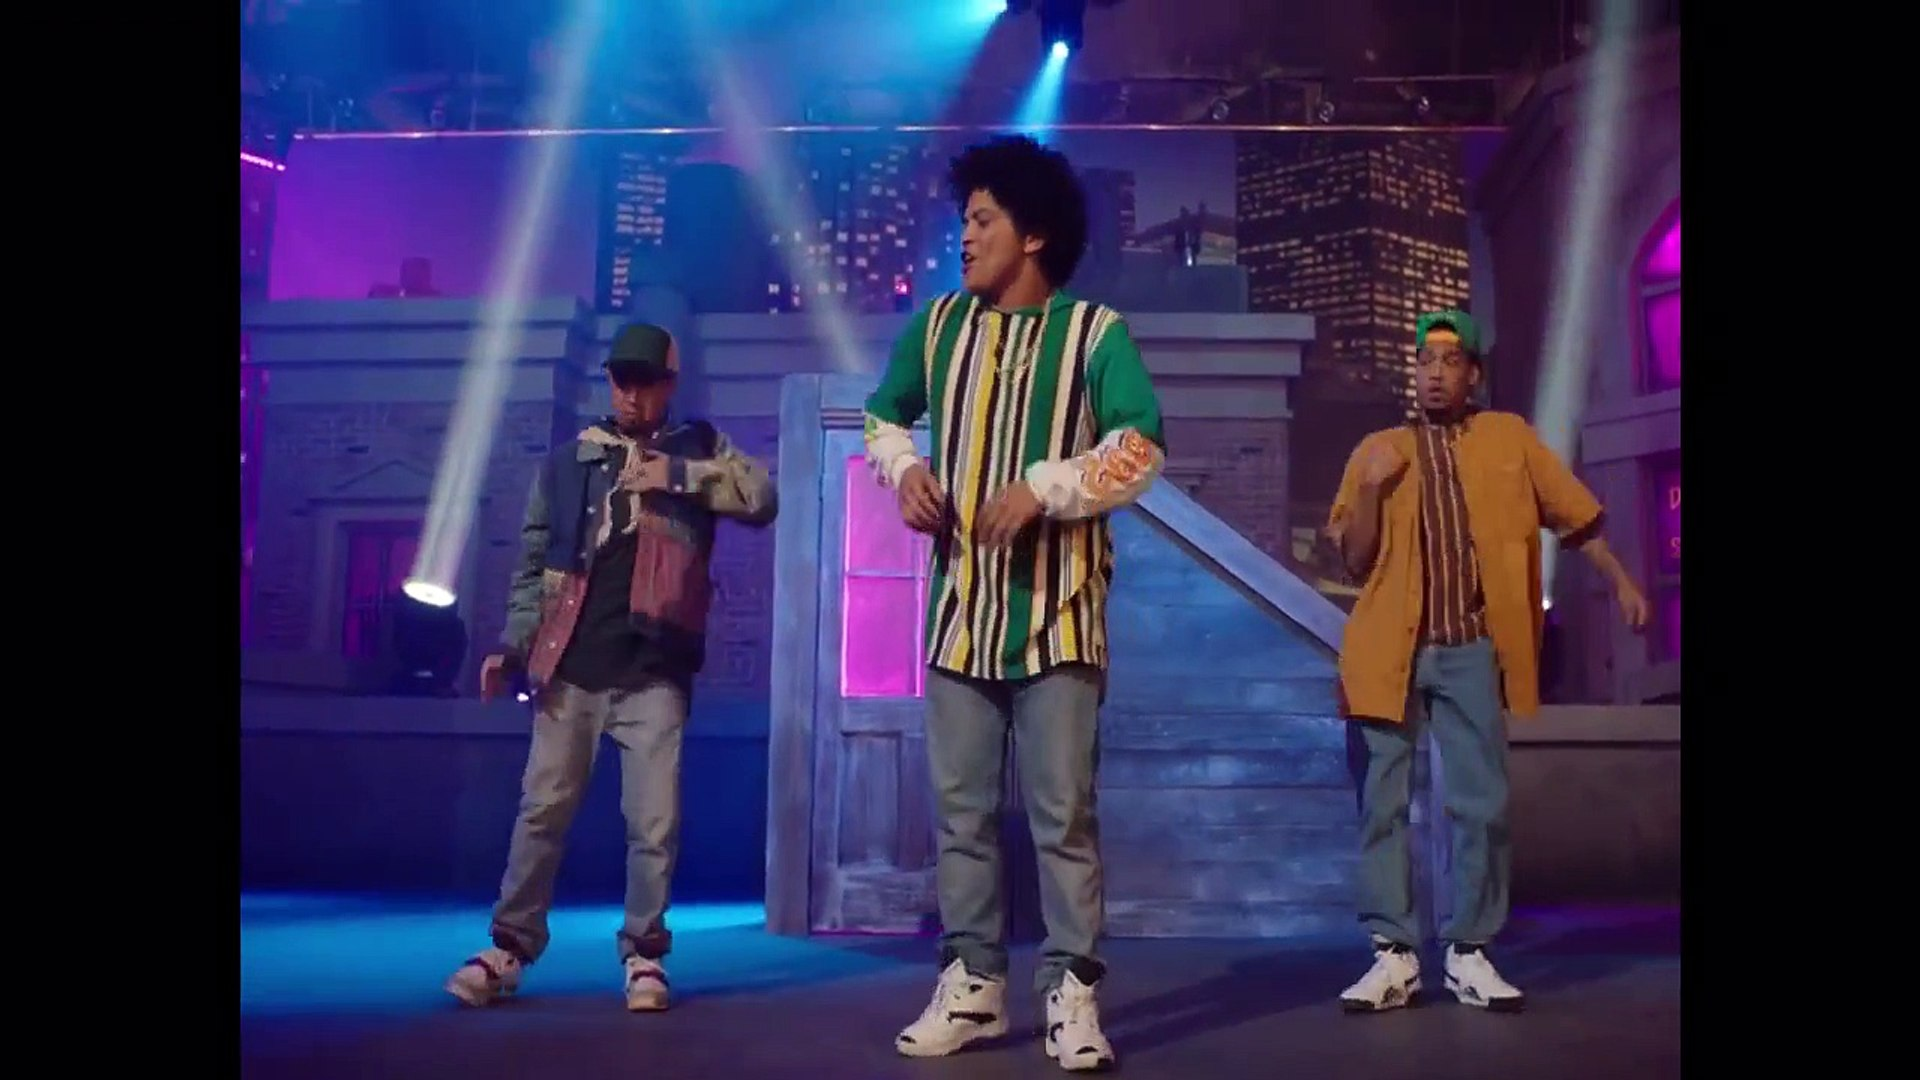 Bruno Mars Ft. Cardi B Finesse G-rod Uptown remix